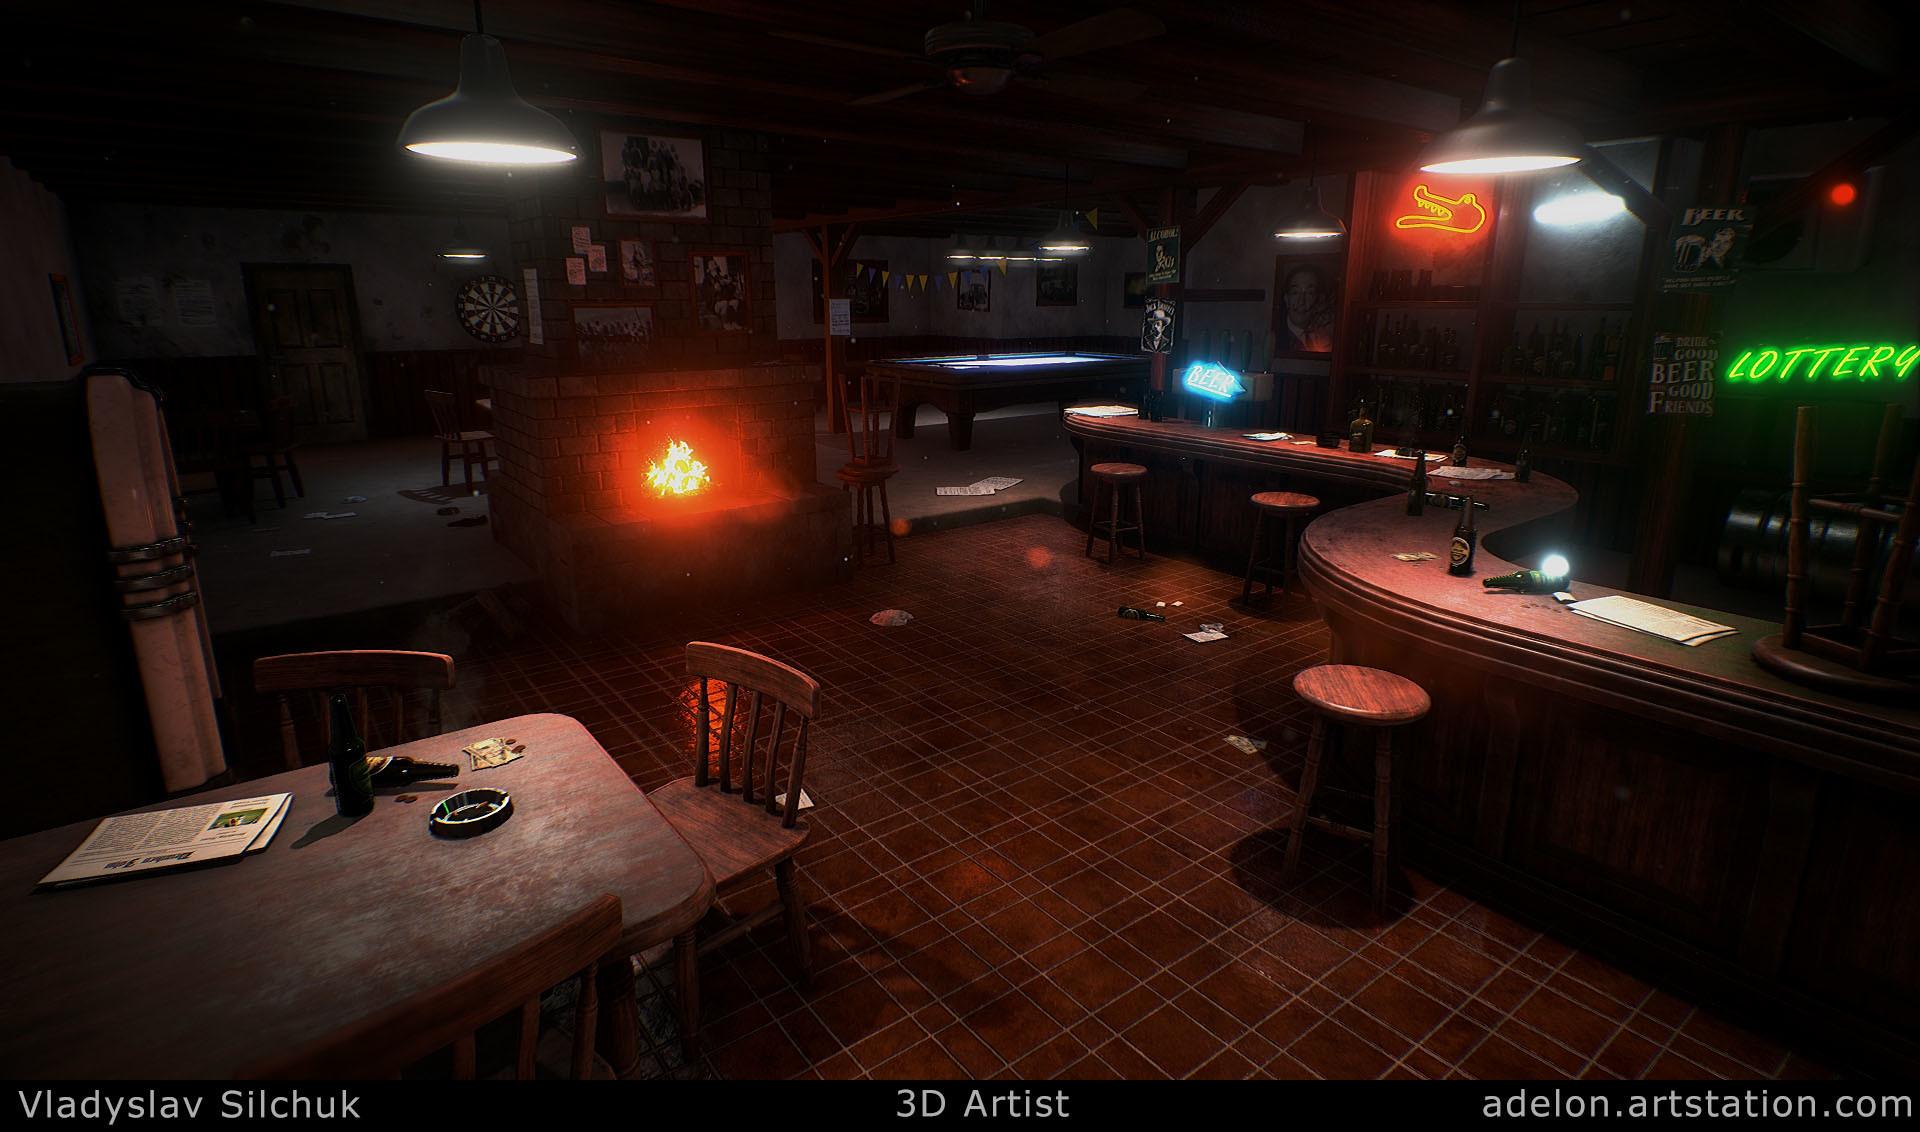 Vladyslav silchuk old pub 1 adelon